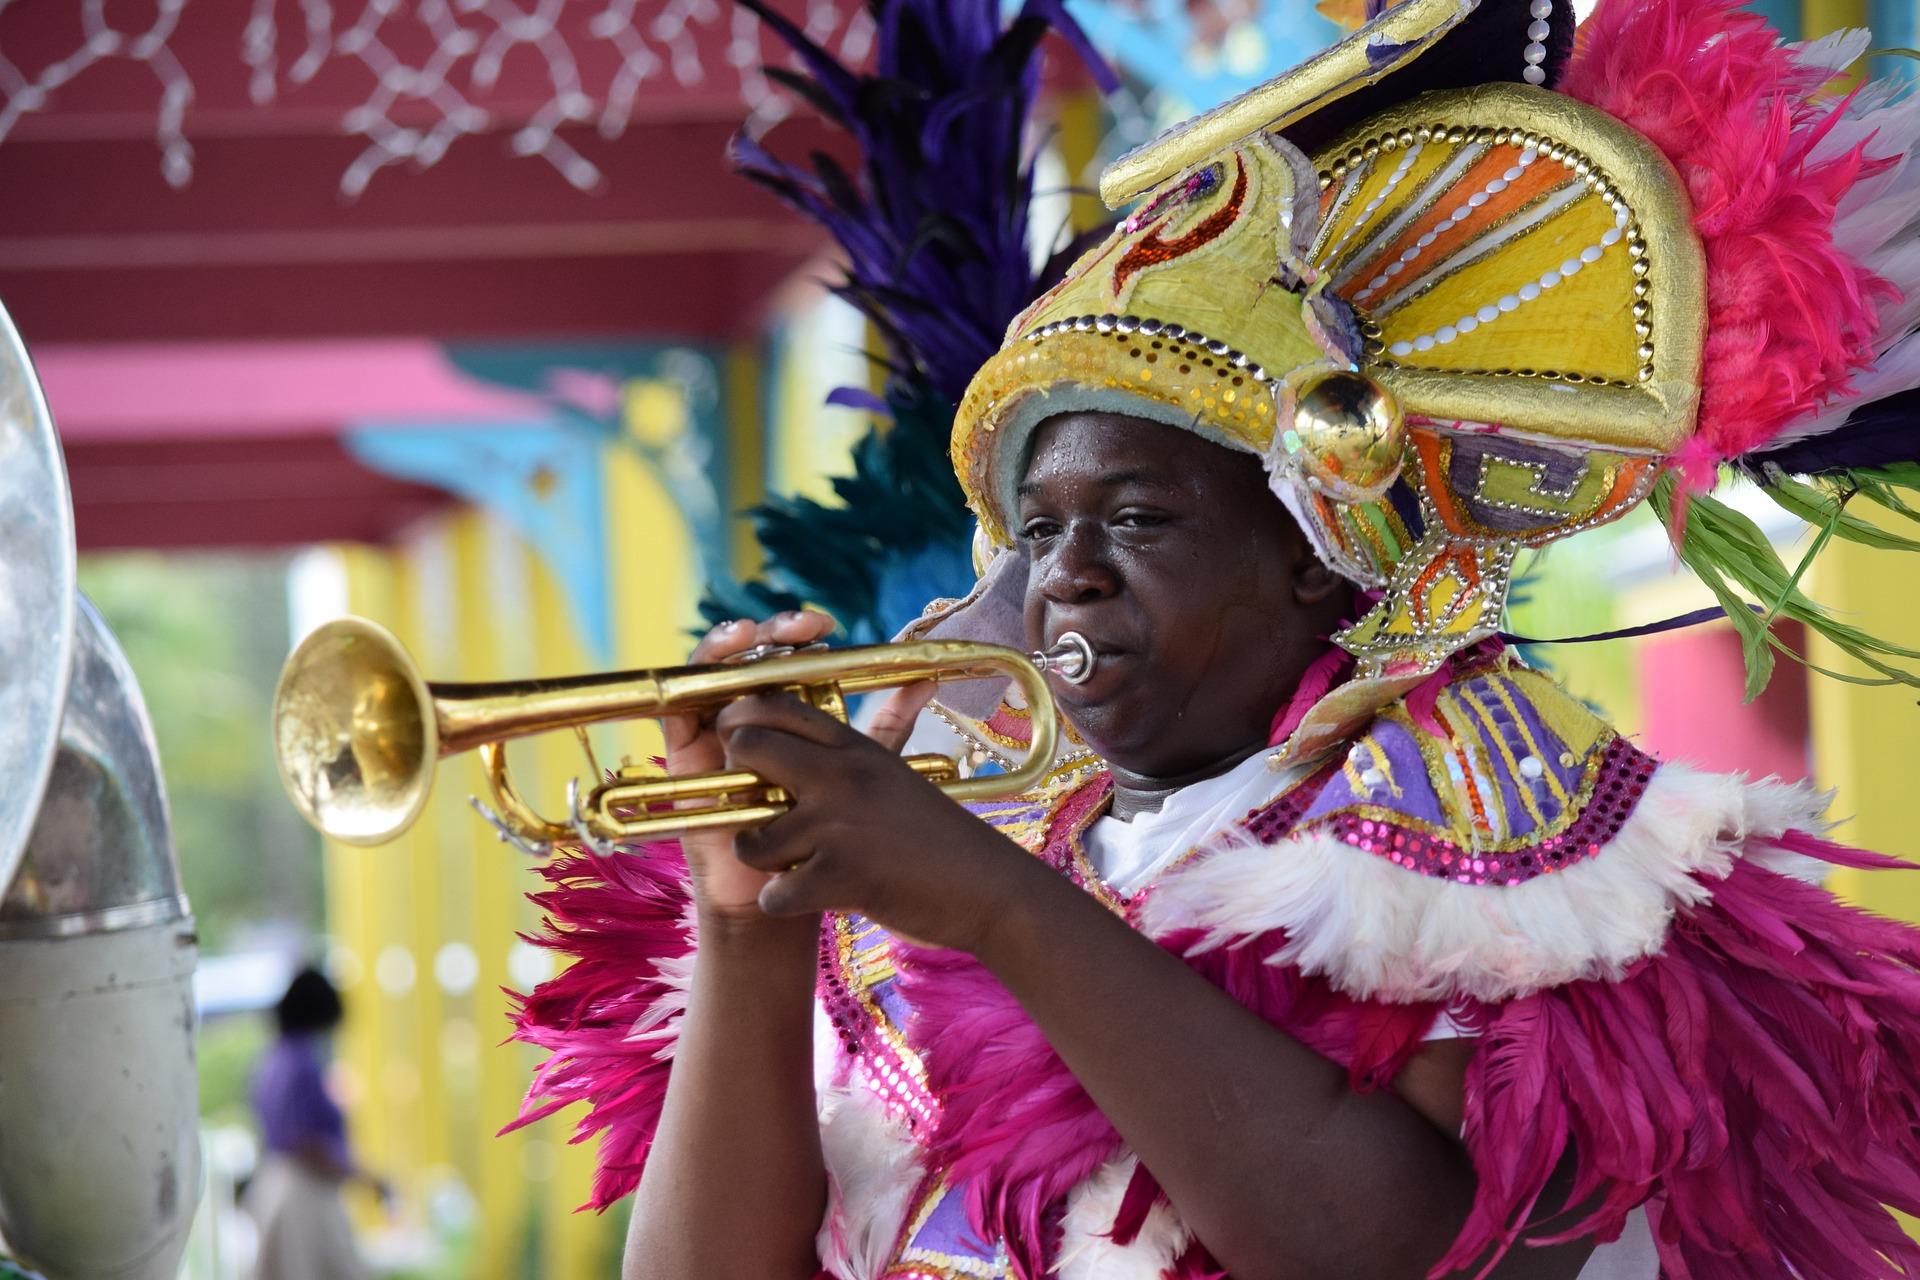 Festival_Nassau_CC0.jpg?1545992575